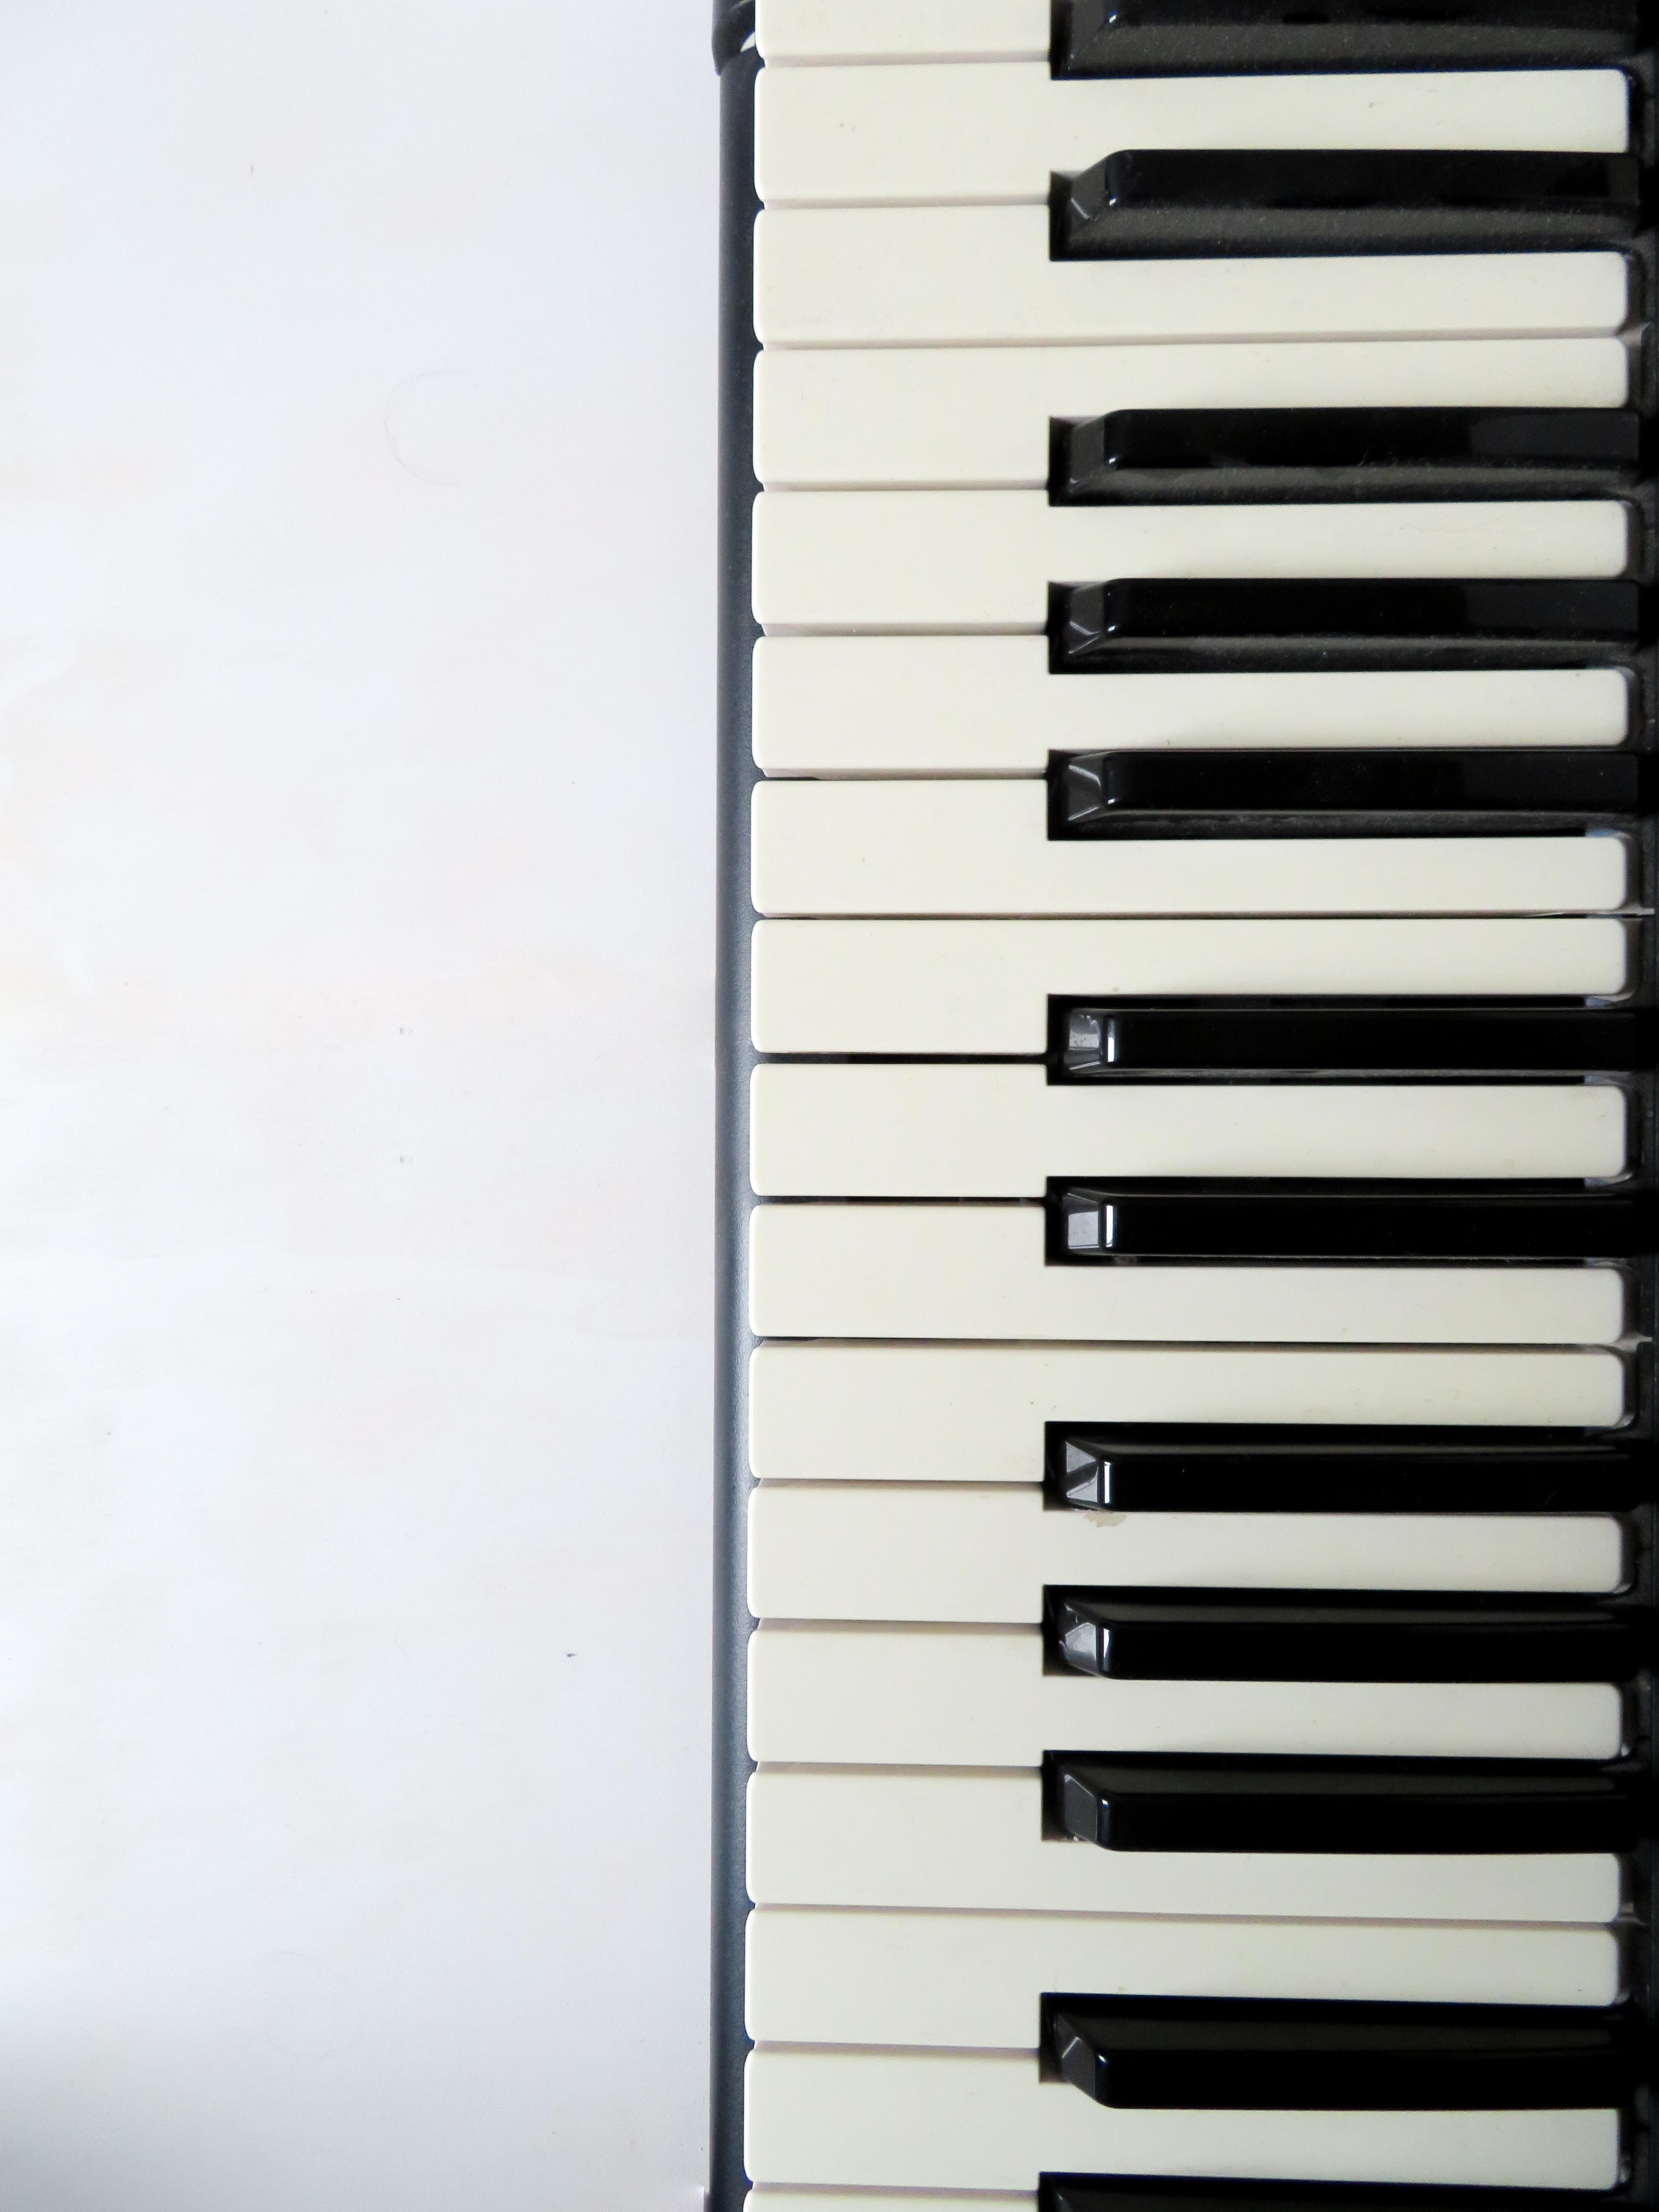 white and black piano keyboard